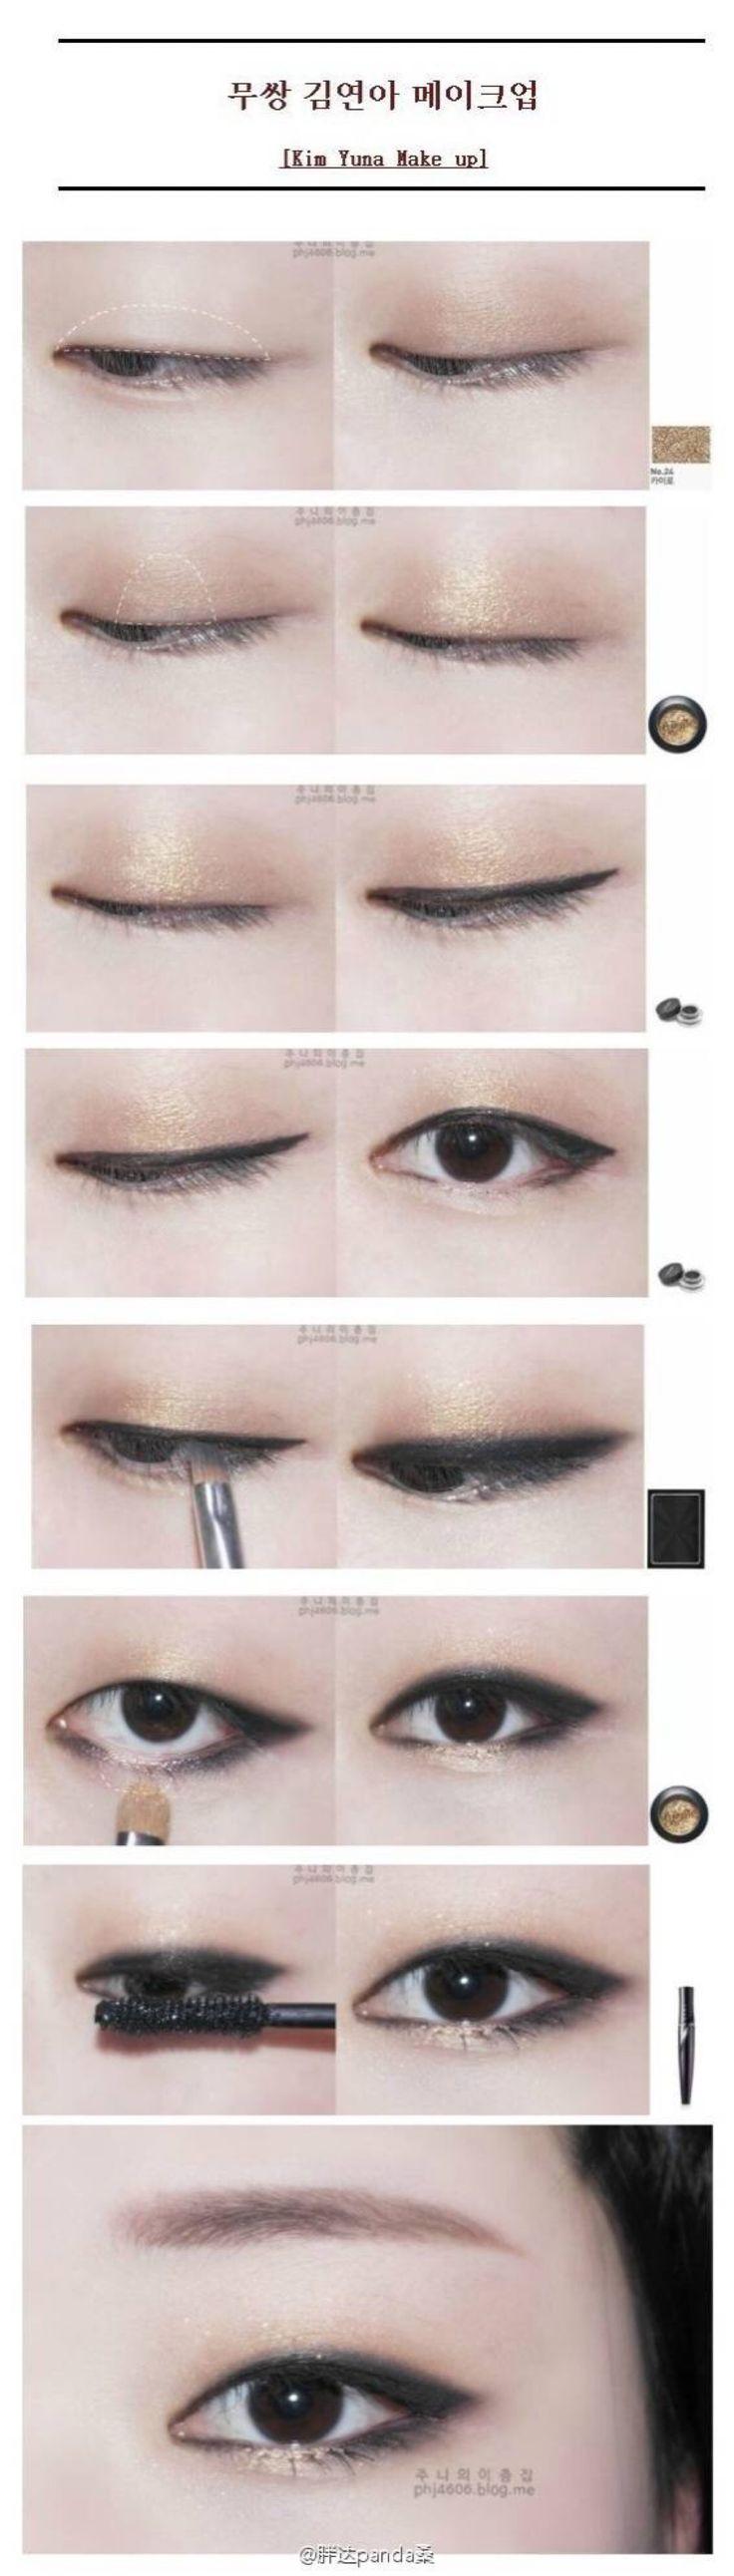 korean kim yuna monolid makeup  ☀️ #DebbieKrug #JoinNerium #NeriumKorea  www.SkincareInKorea.info ⭐️⭐️ ☀️www.AsianSkincare.Rocks